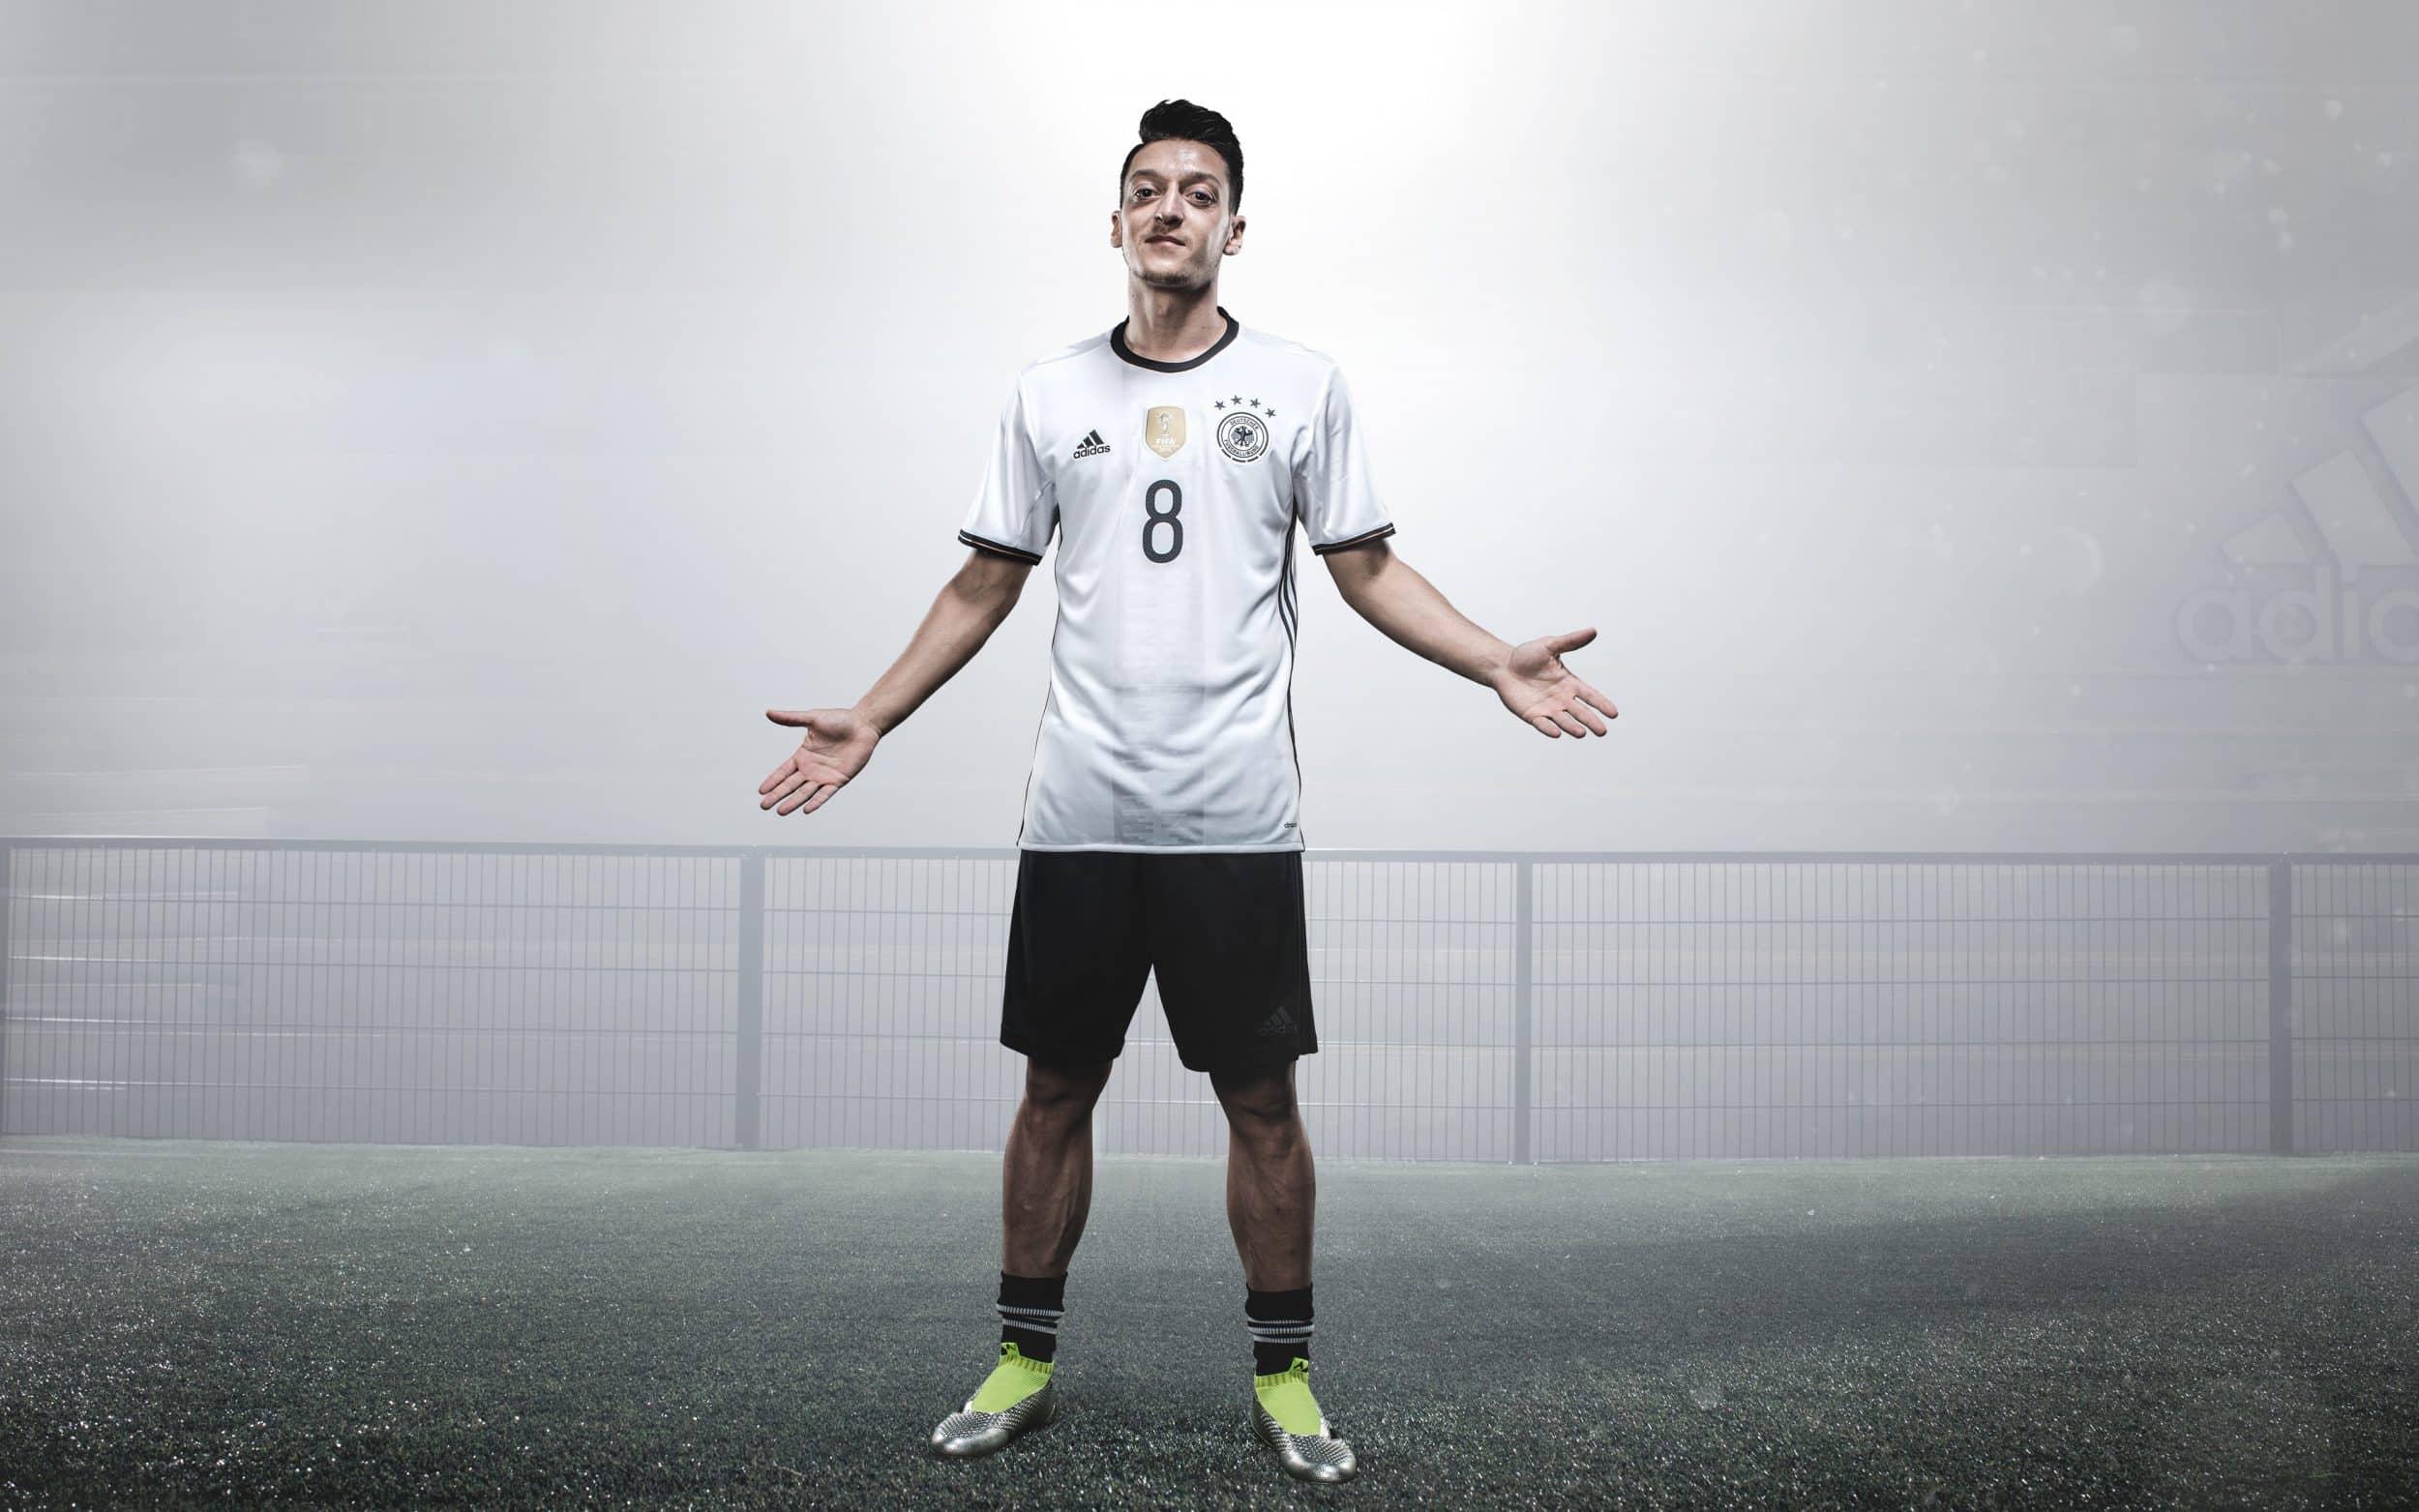 chaussure-football-adidas-ACE16-euro-2016-ozil-2-min